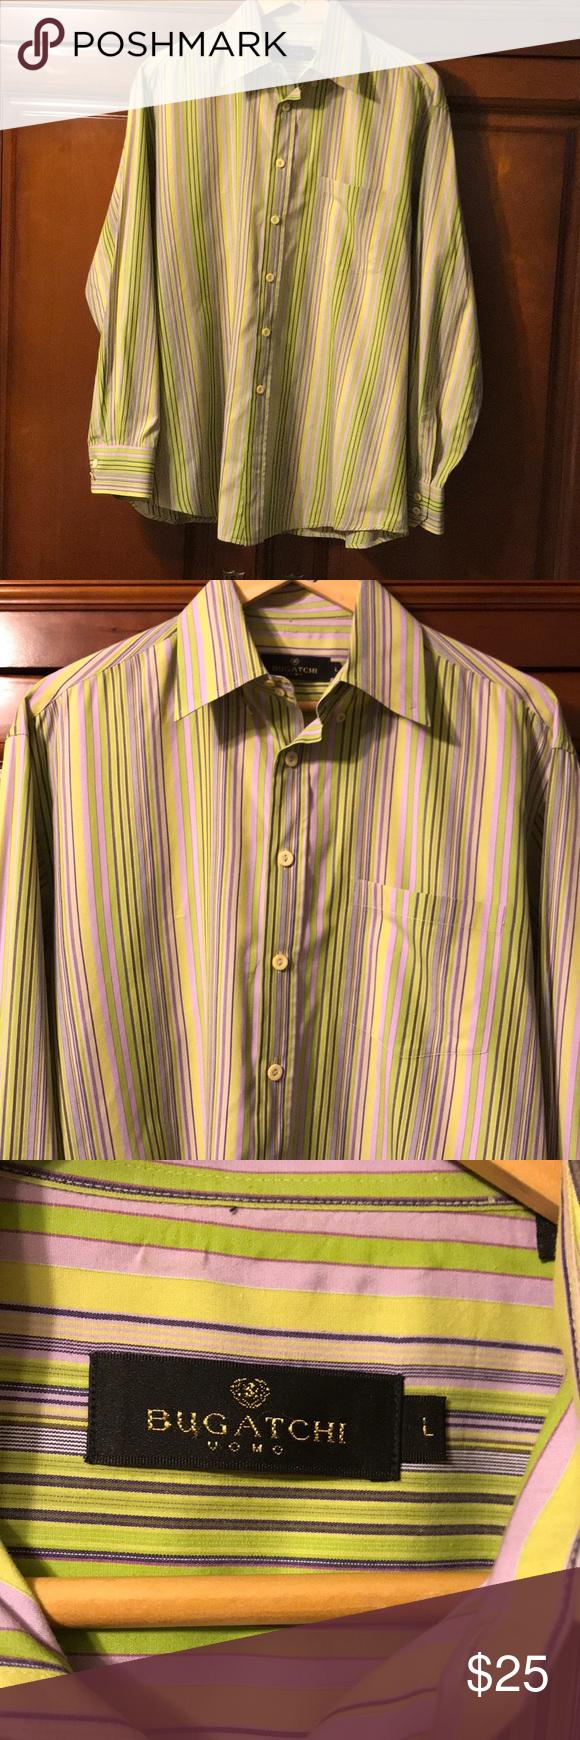 Dark green dress shirt  BUGATCHI VOMO button down shirt size Large  My Posh Closet